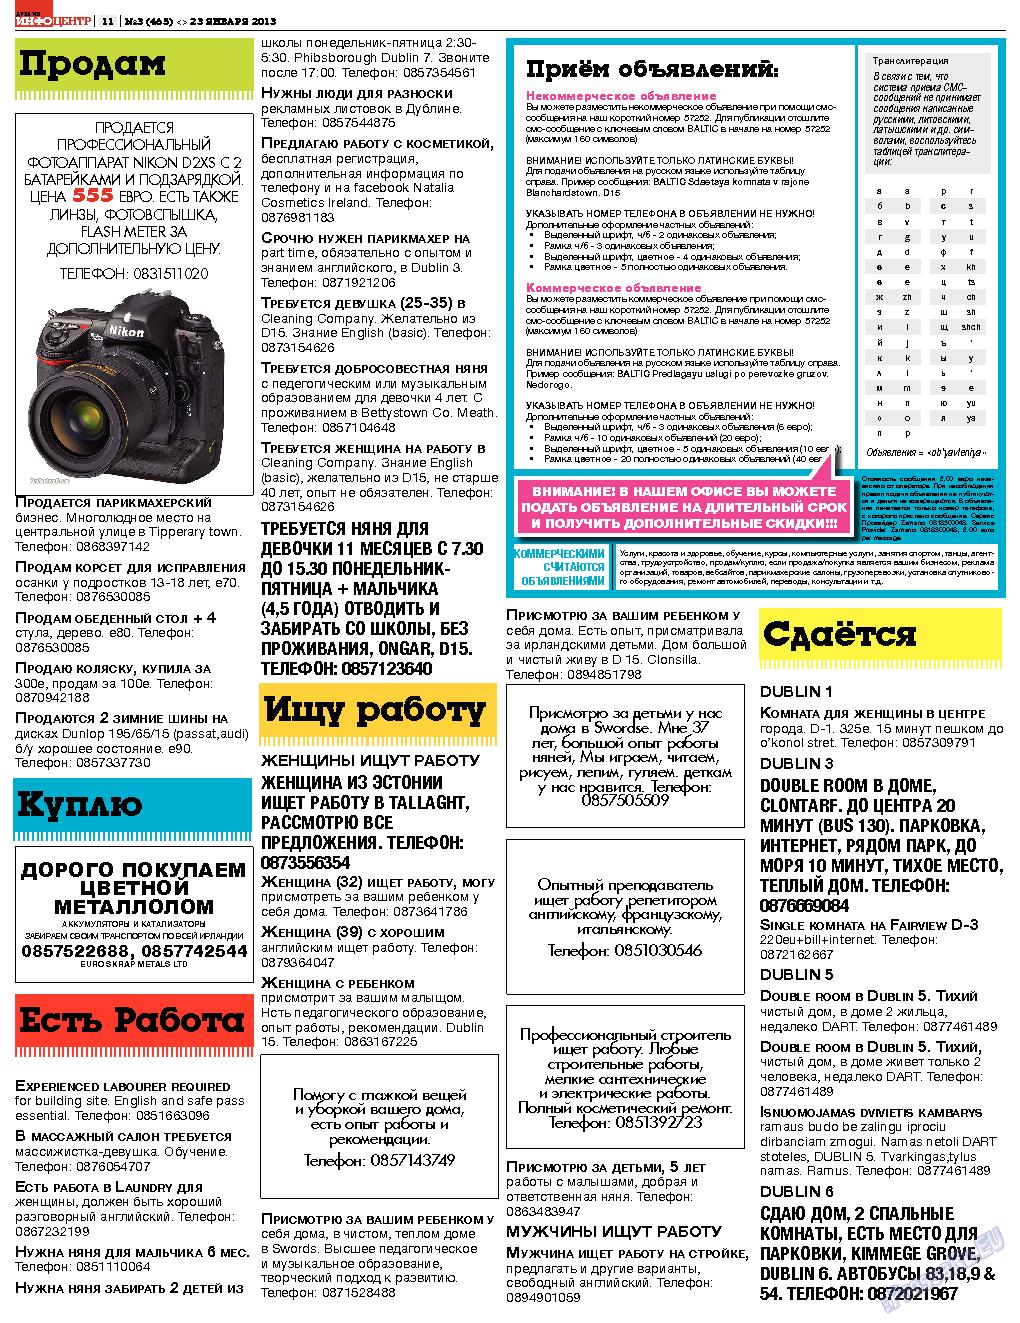 Дублин инфоцентр (газета). 2013 год, номер 3, стр. 11